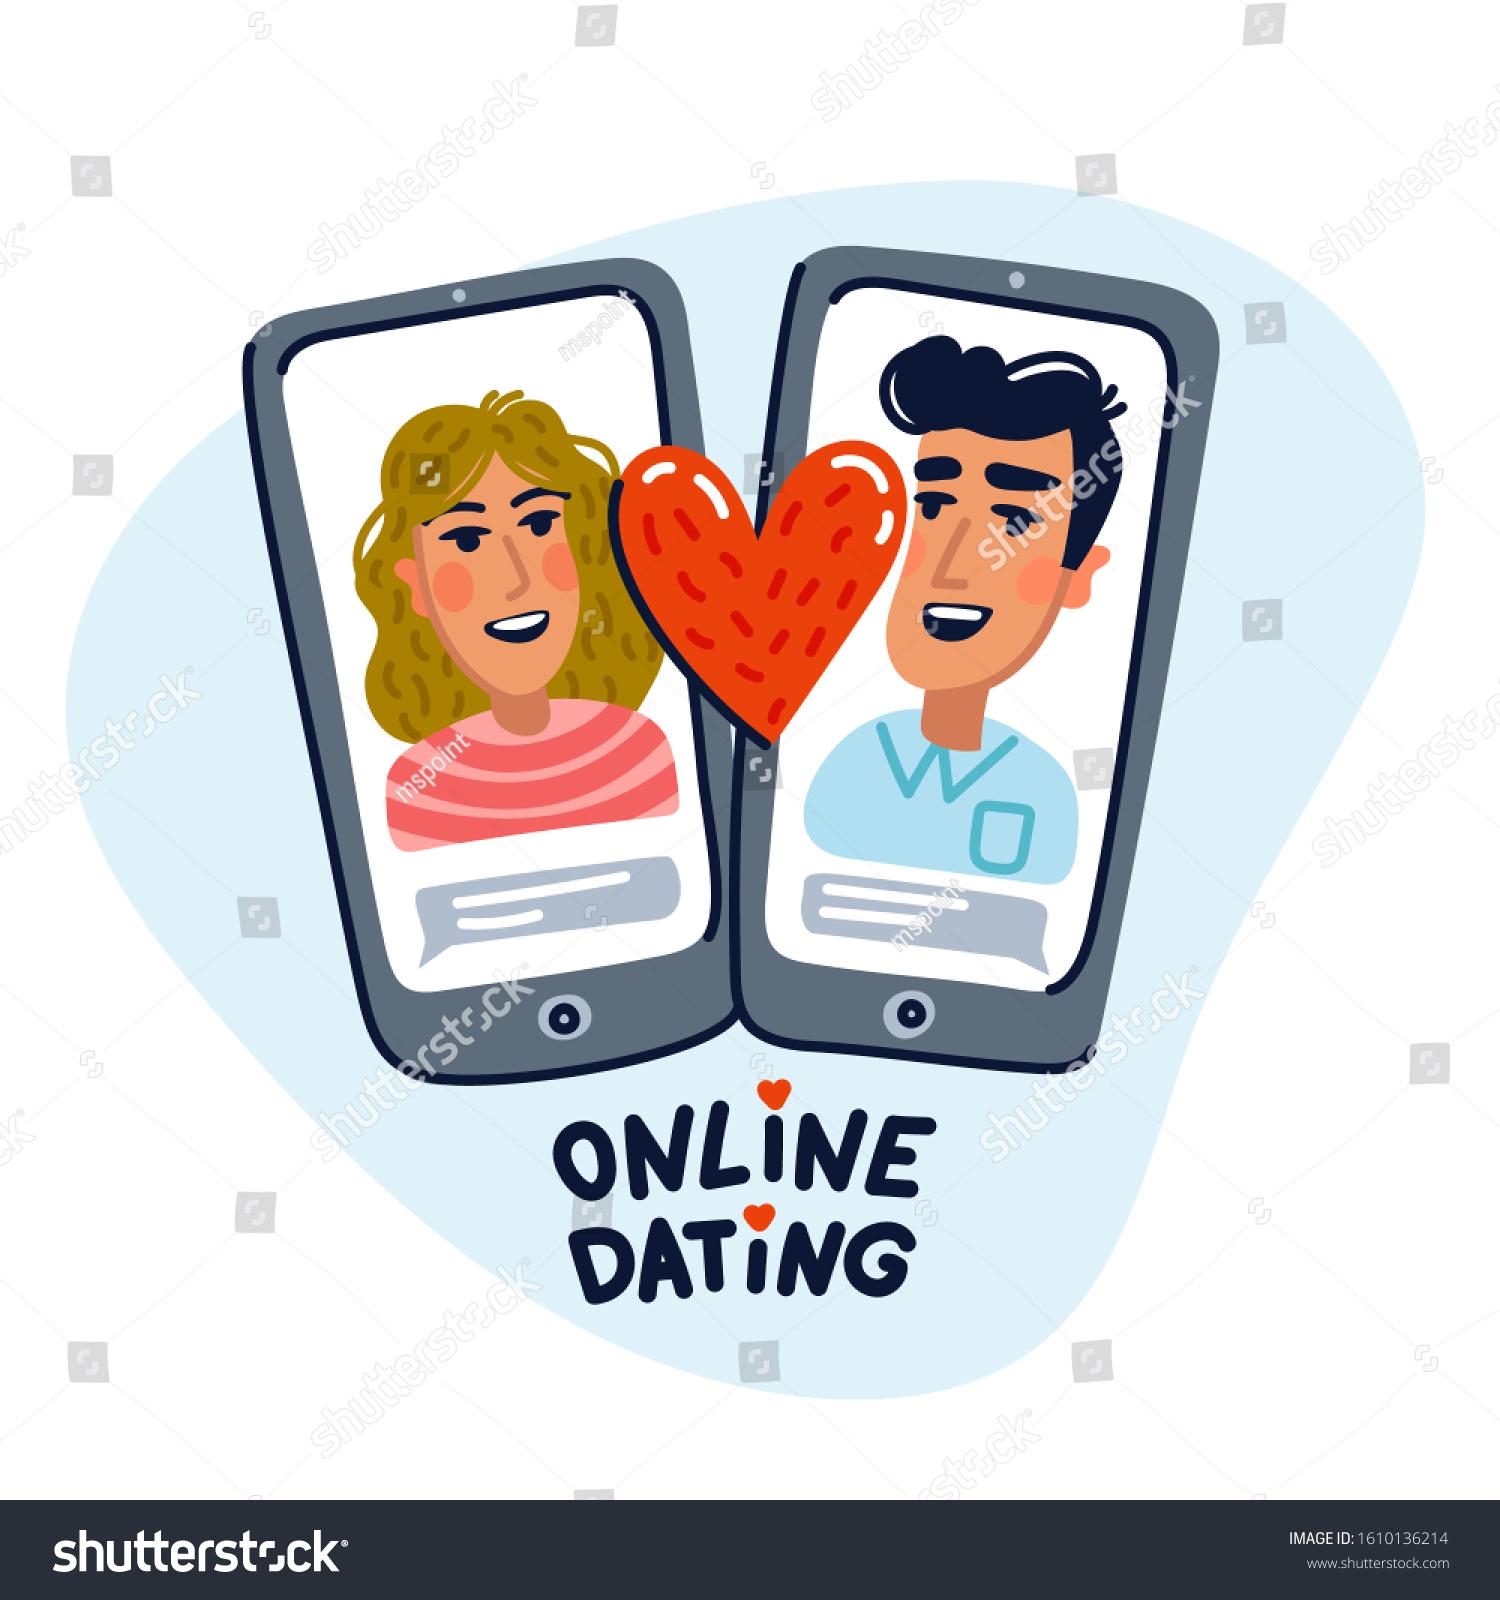 Couples online dating omari hardwick dating